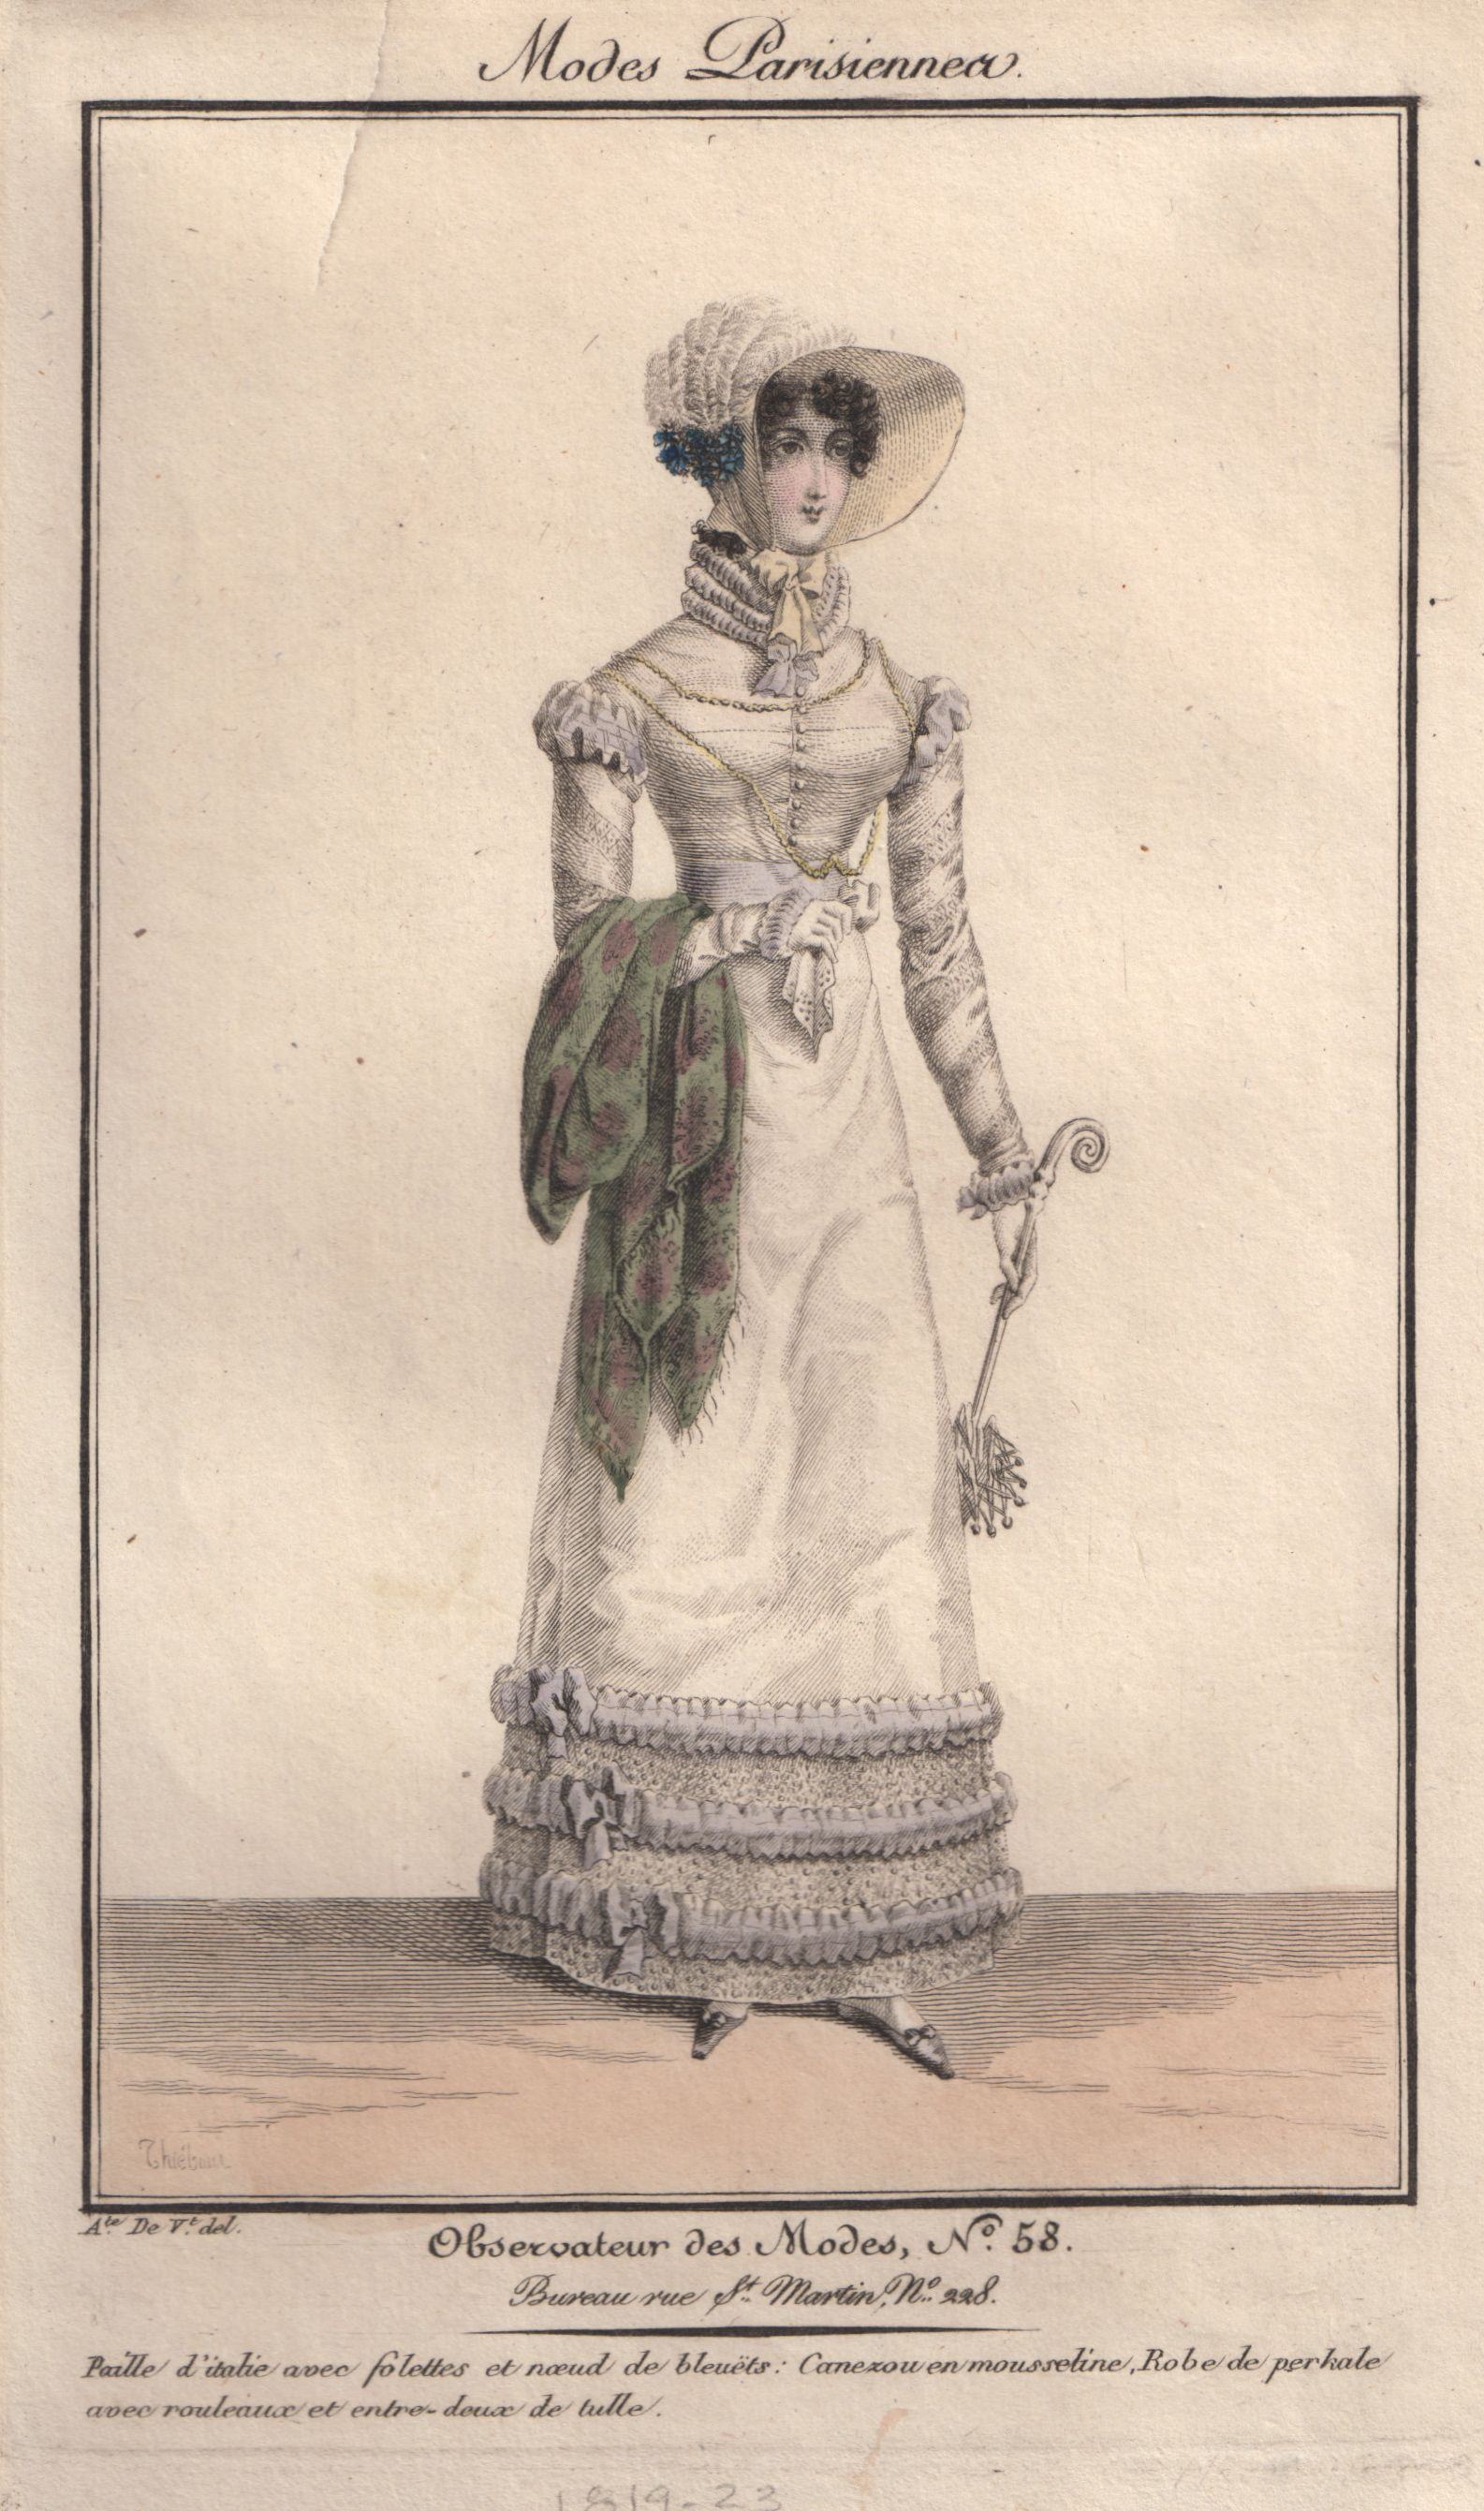 Plate 58 - Observateur des Modes